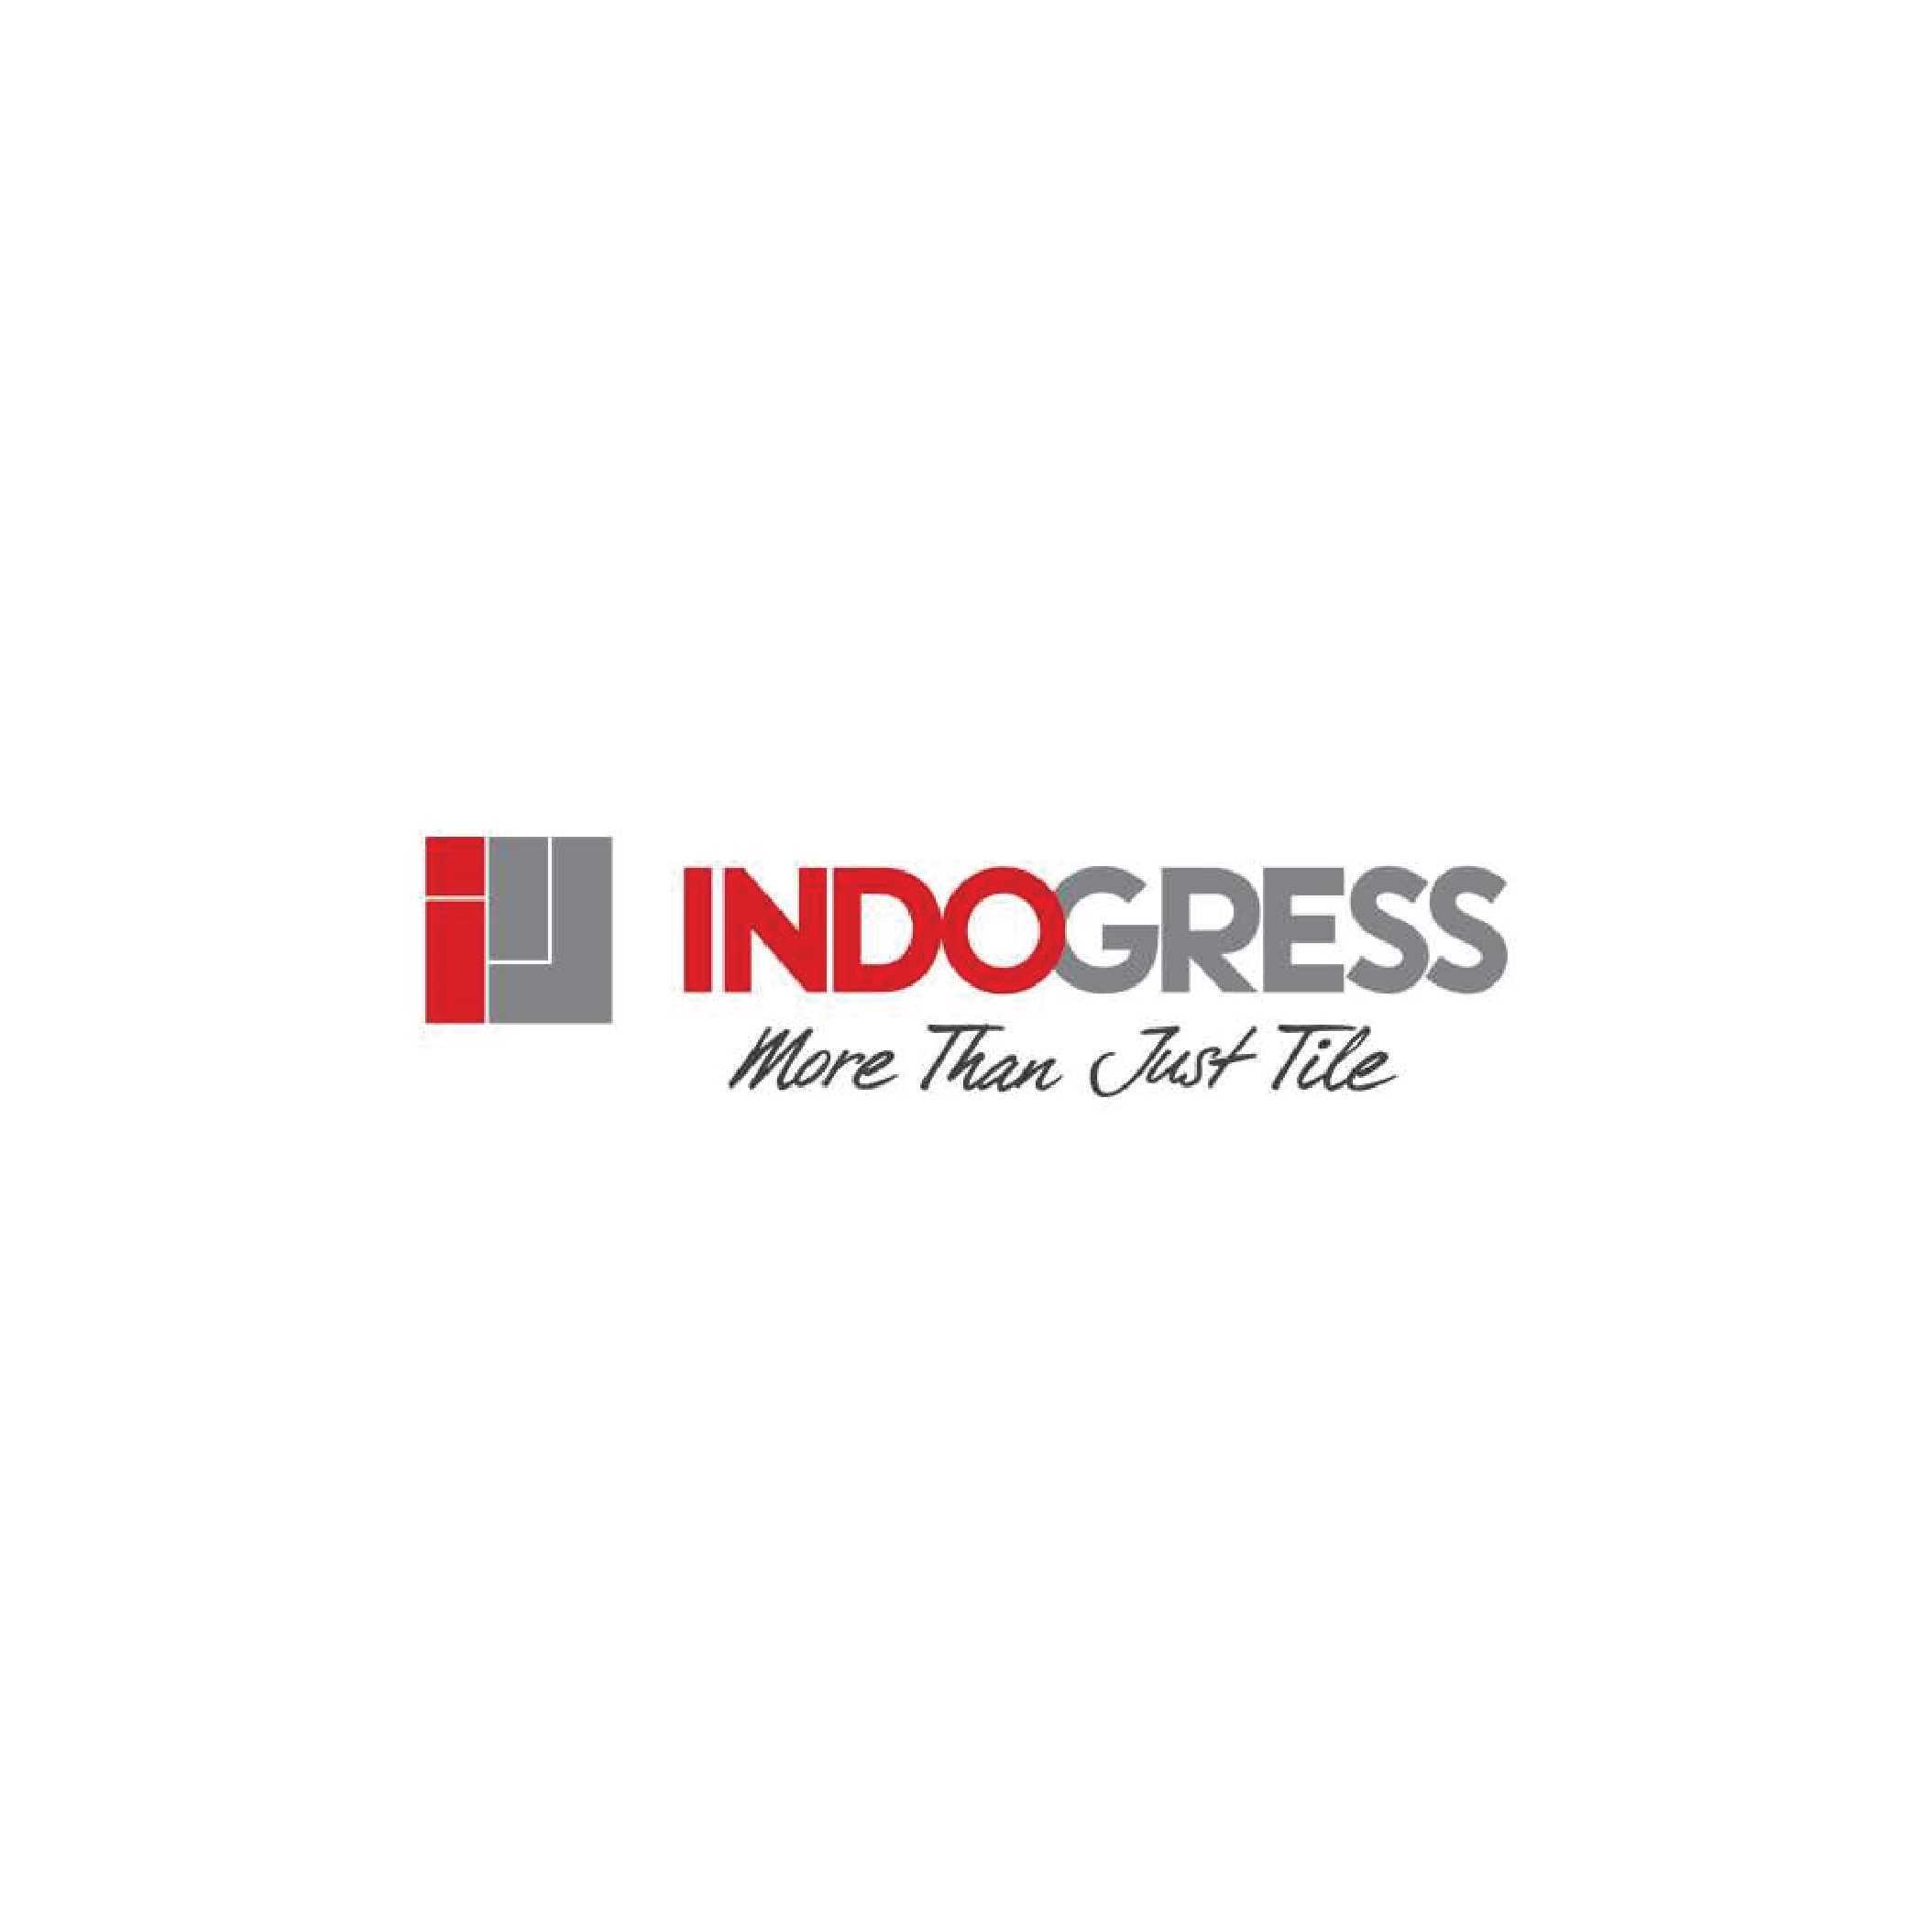 INDOGRESS